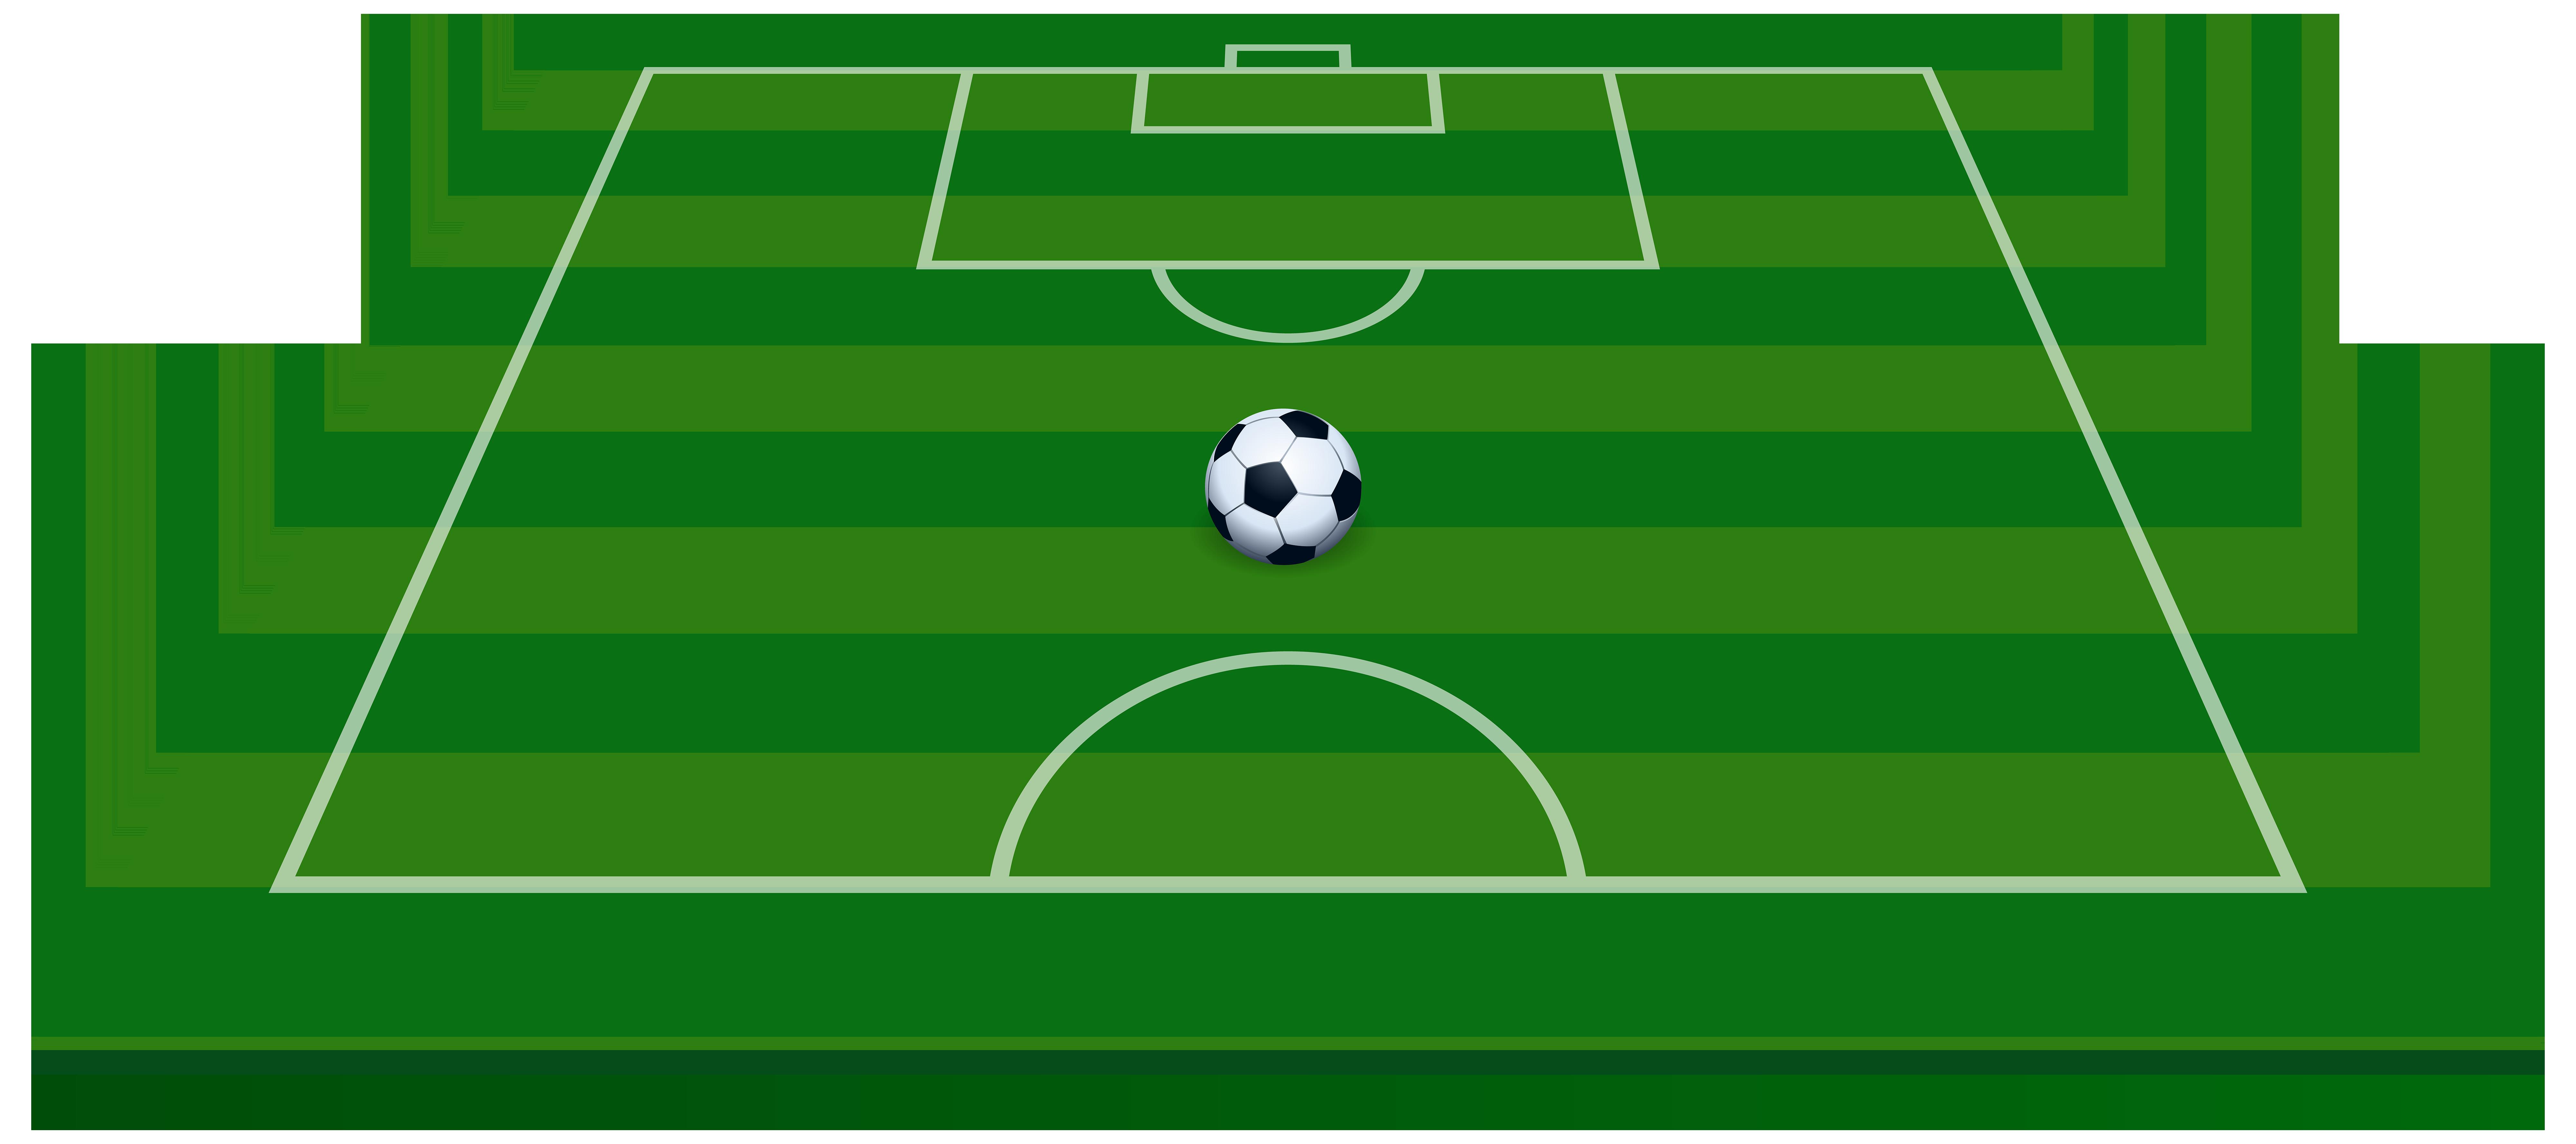 Soccer Field Transparent PNG Clip Art Image.